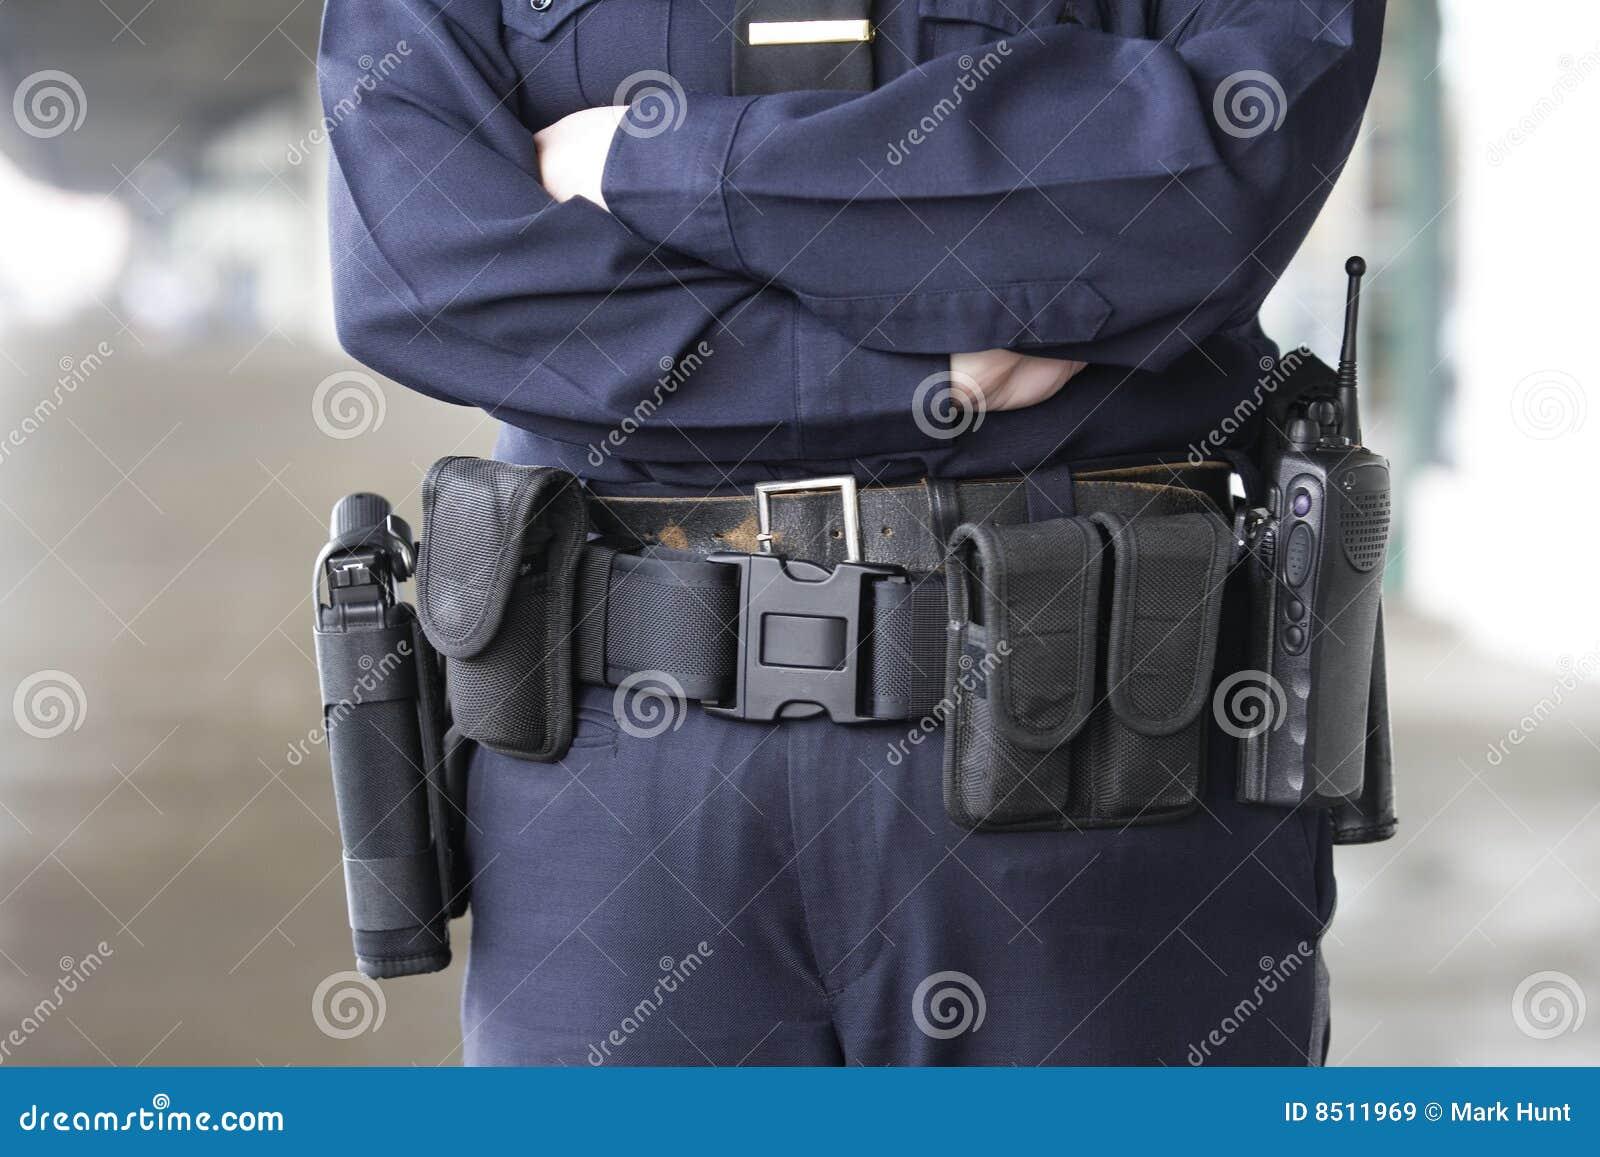 Beat cop download free